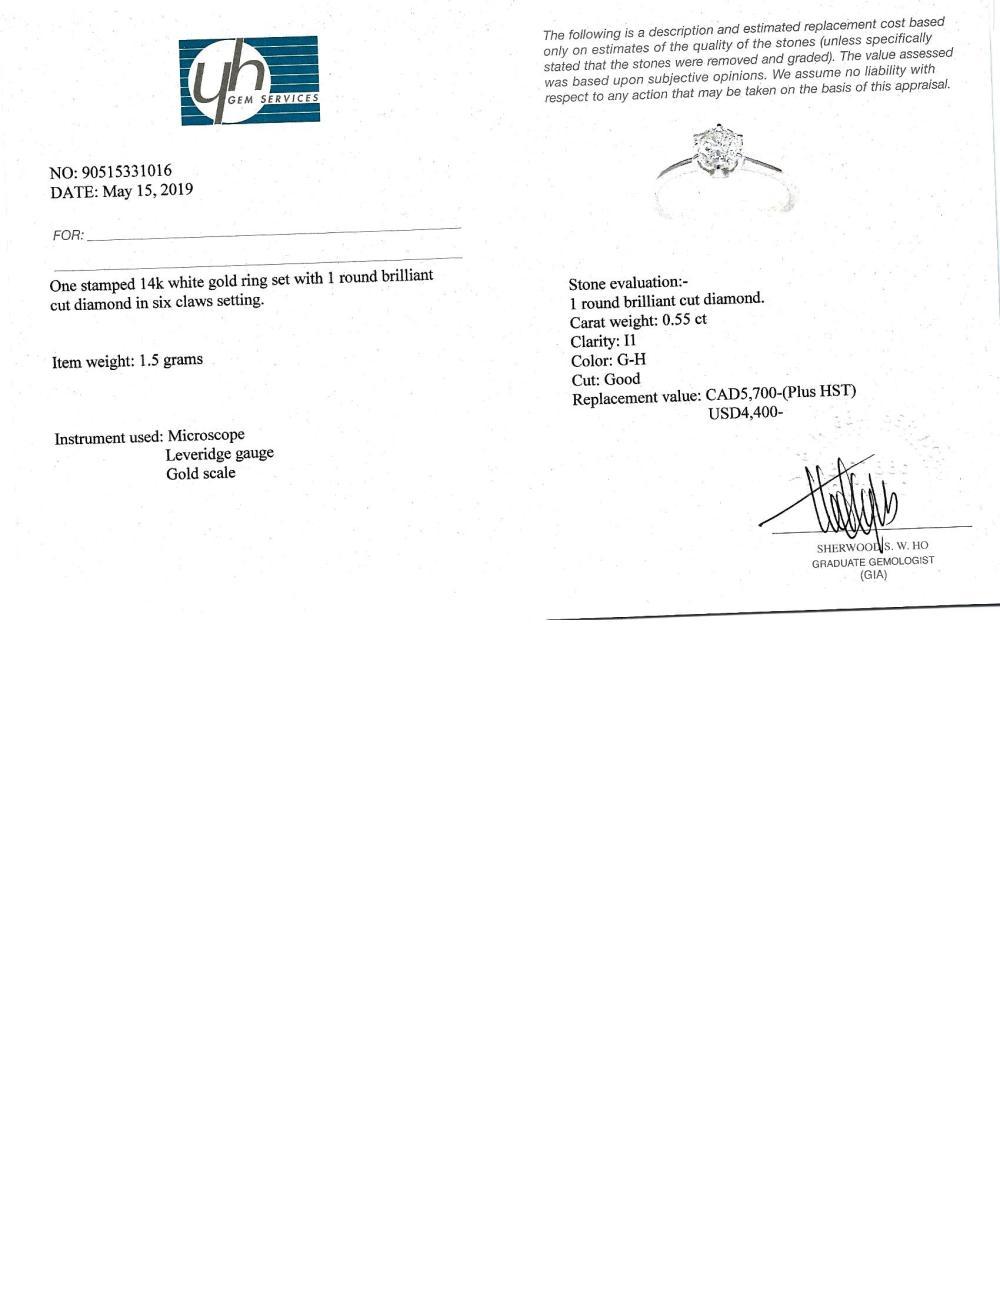 Certified 14K Diamond (I1)(0.55ct) Ring